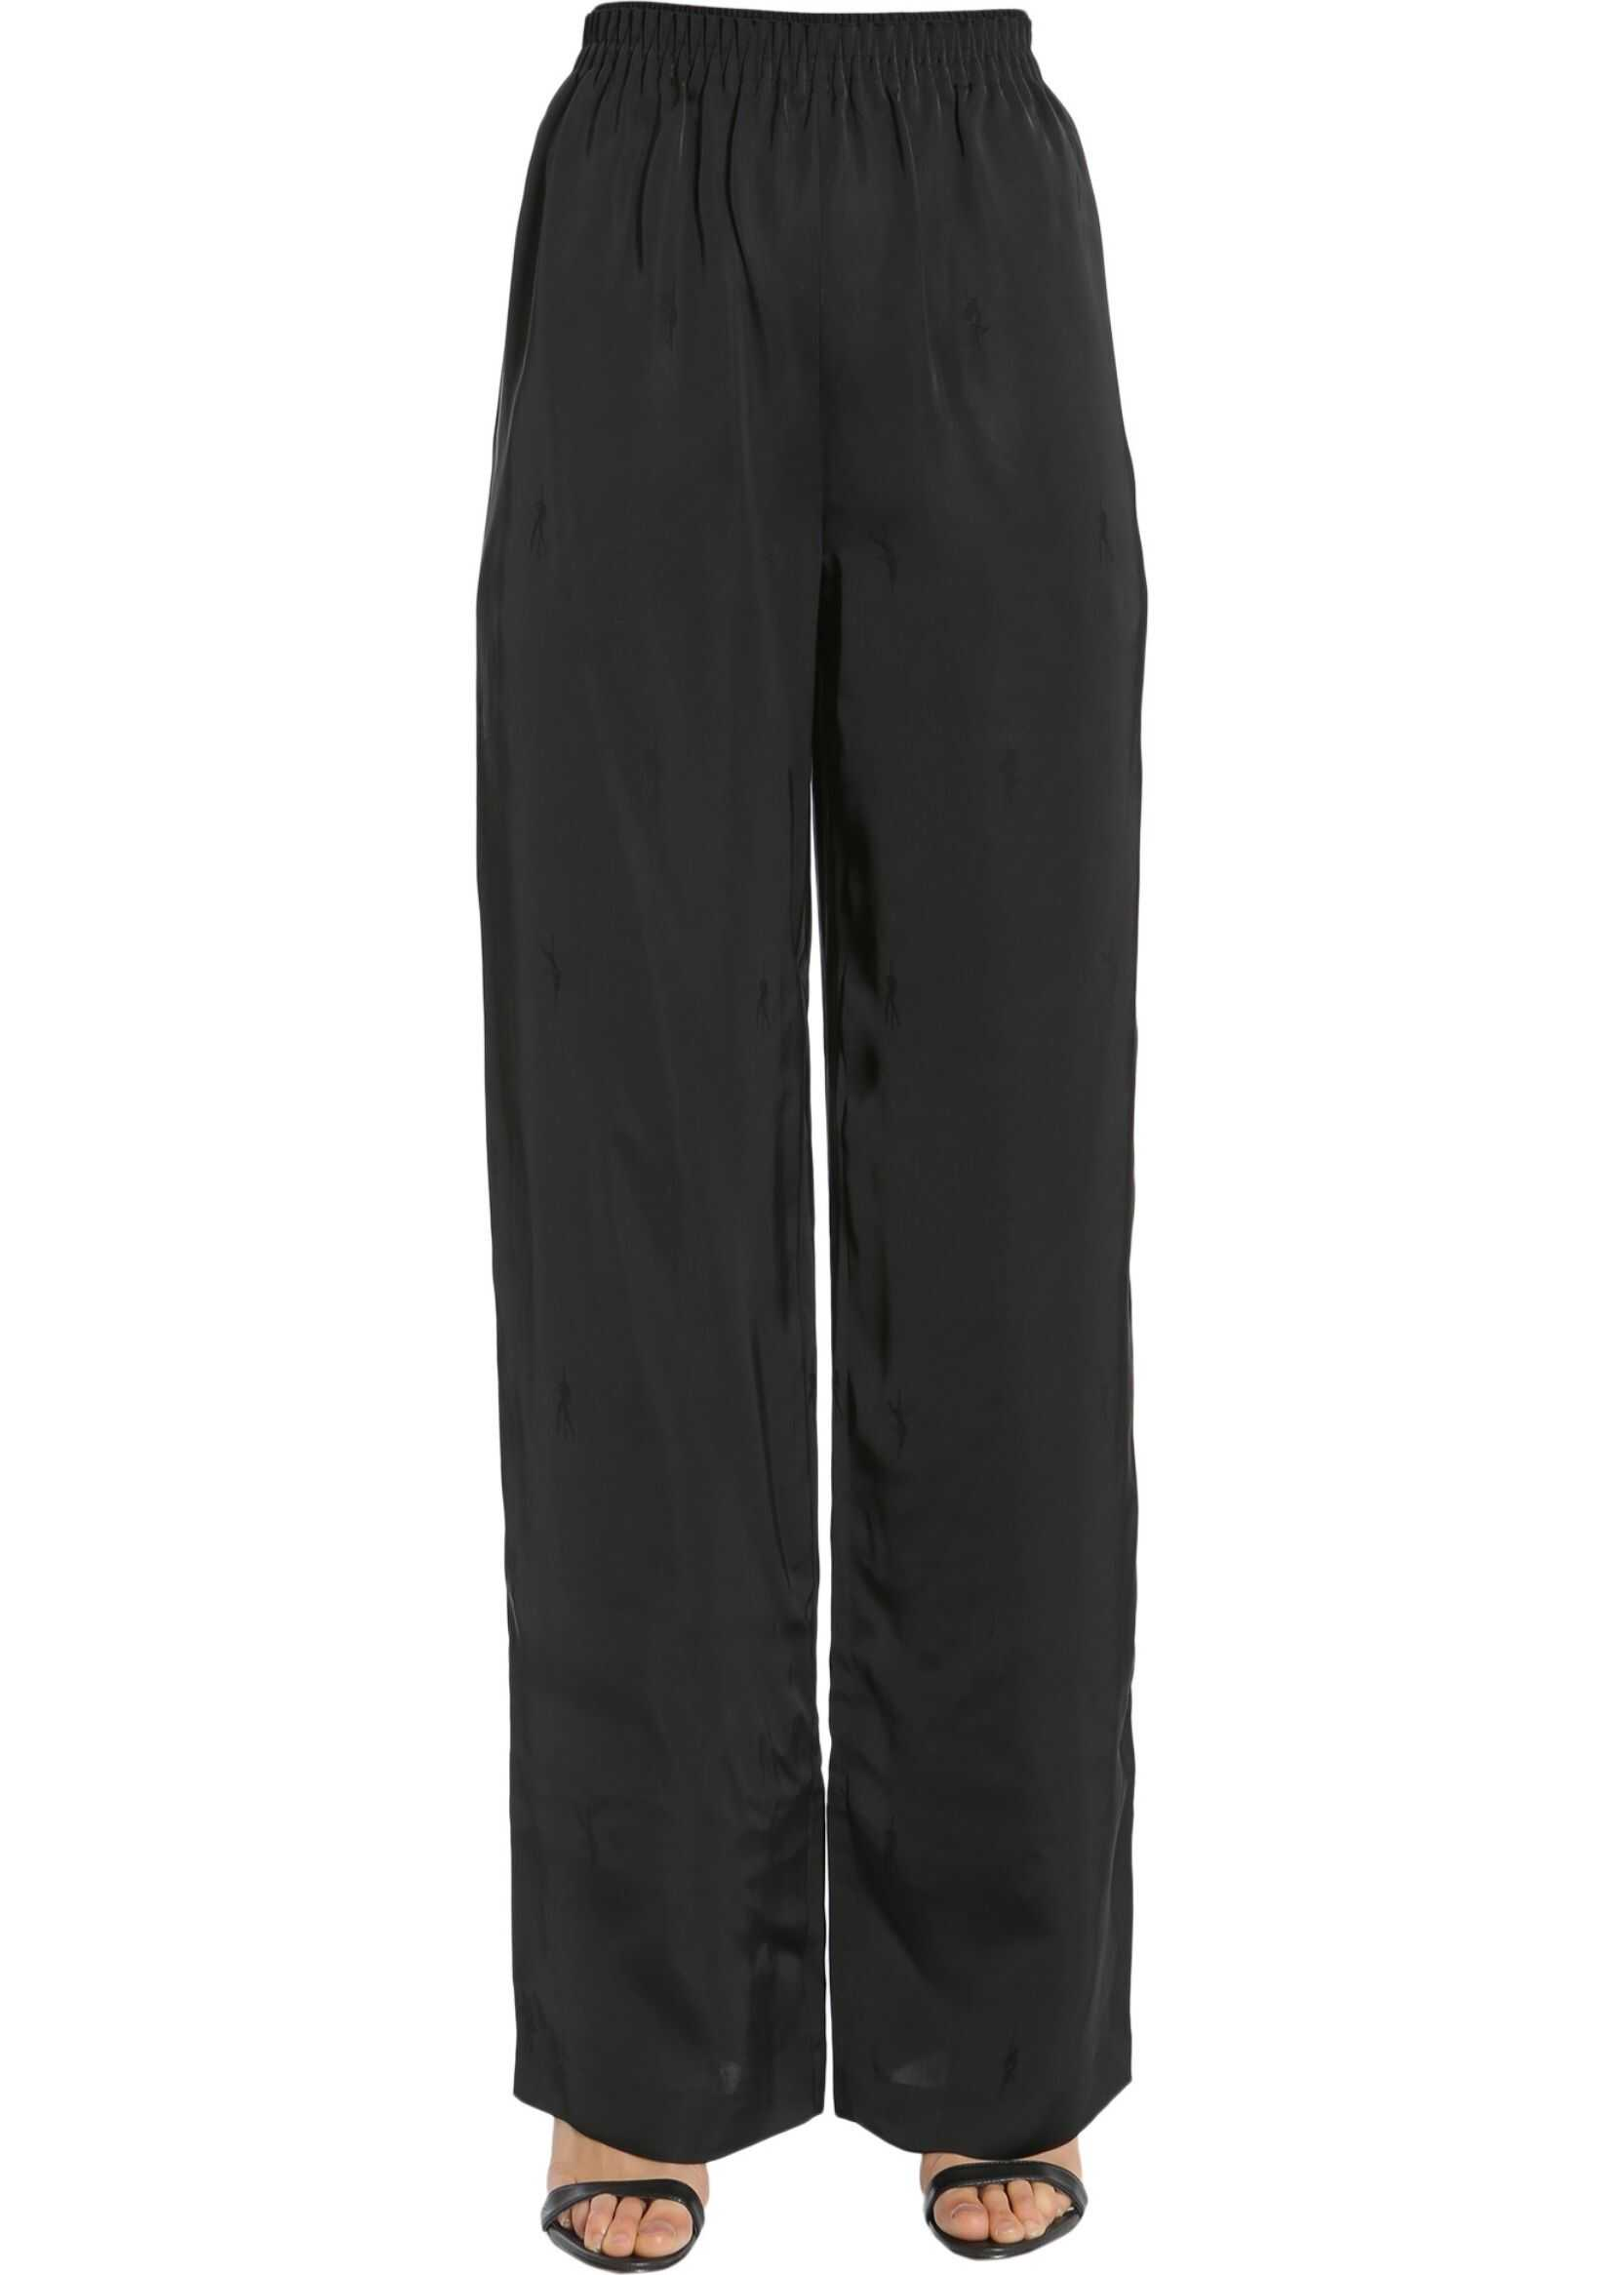 Alexander Wang Wide Leg Trousers BLACK